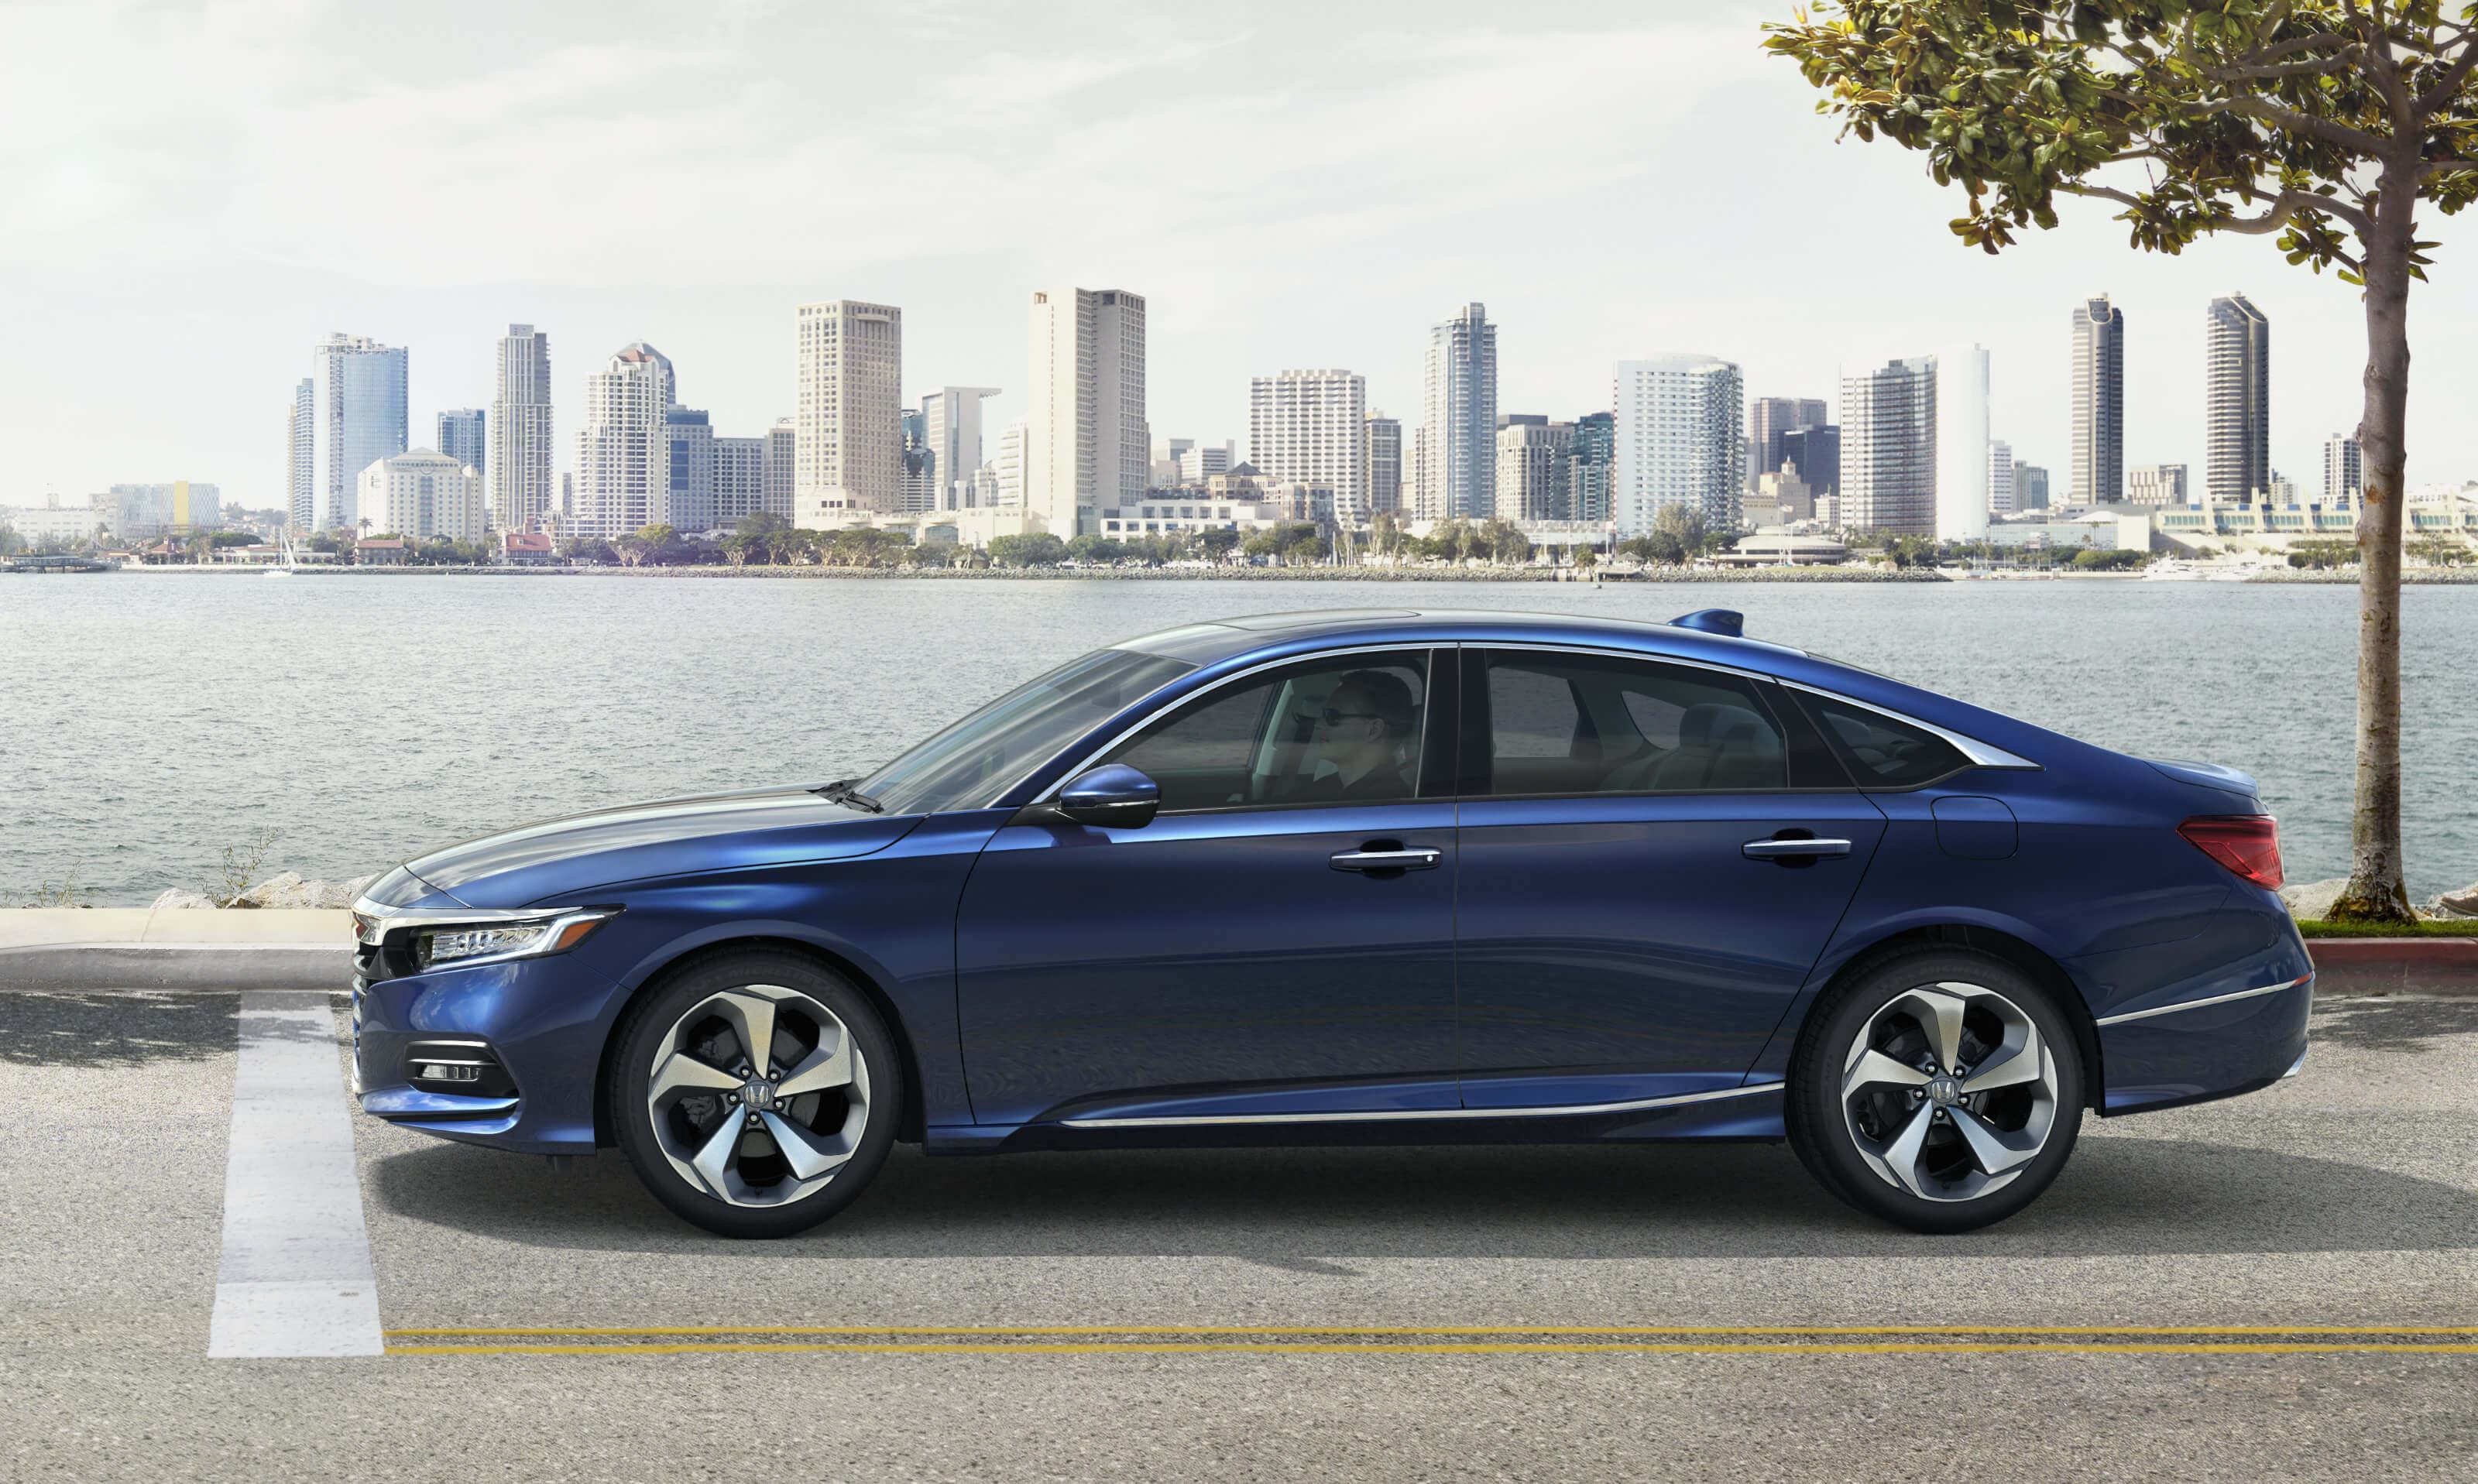 2020 Honda Accord Hybrid side exterior view